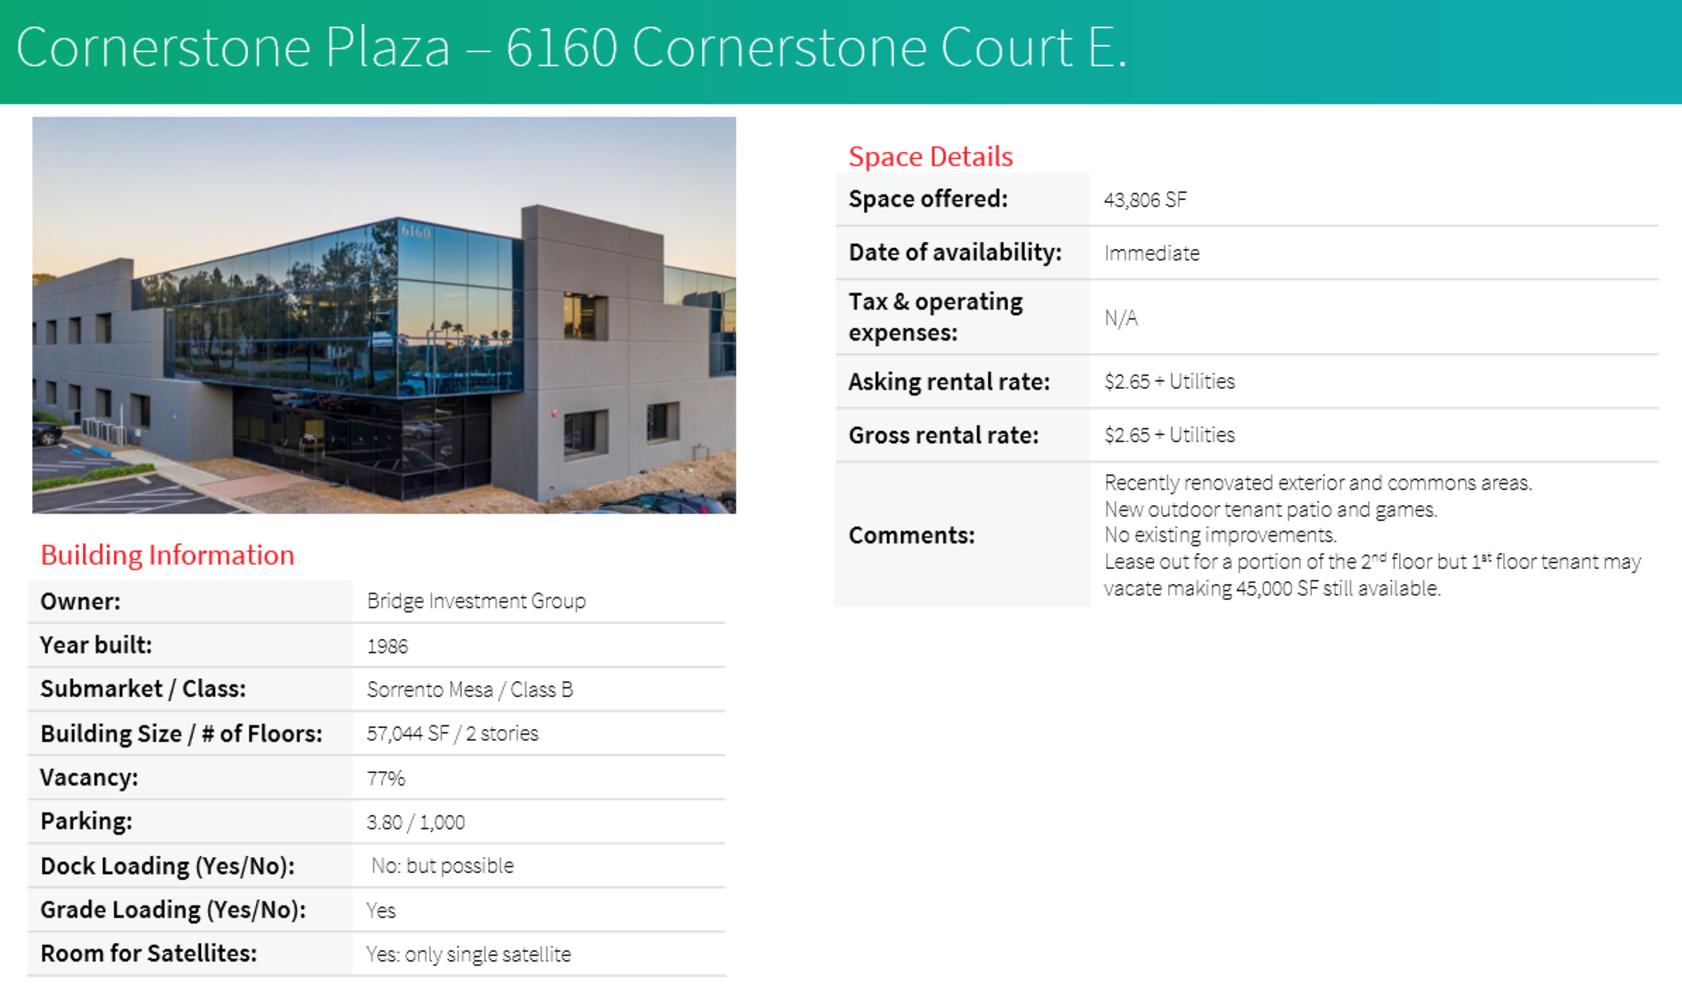 Office San diego, 92121 - 6160 Cornerstone Ct E